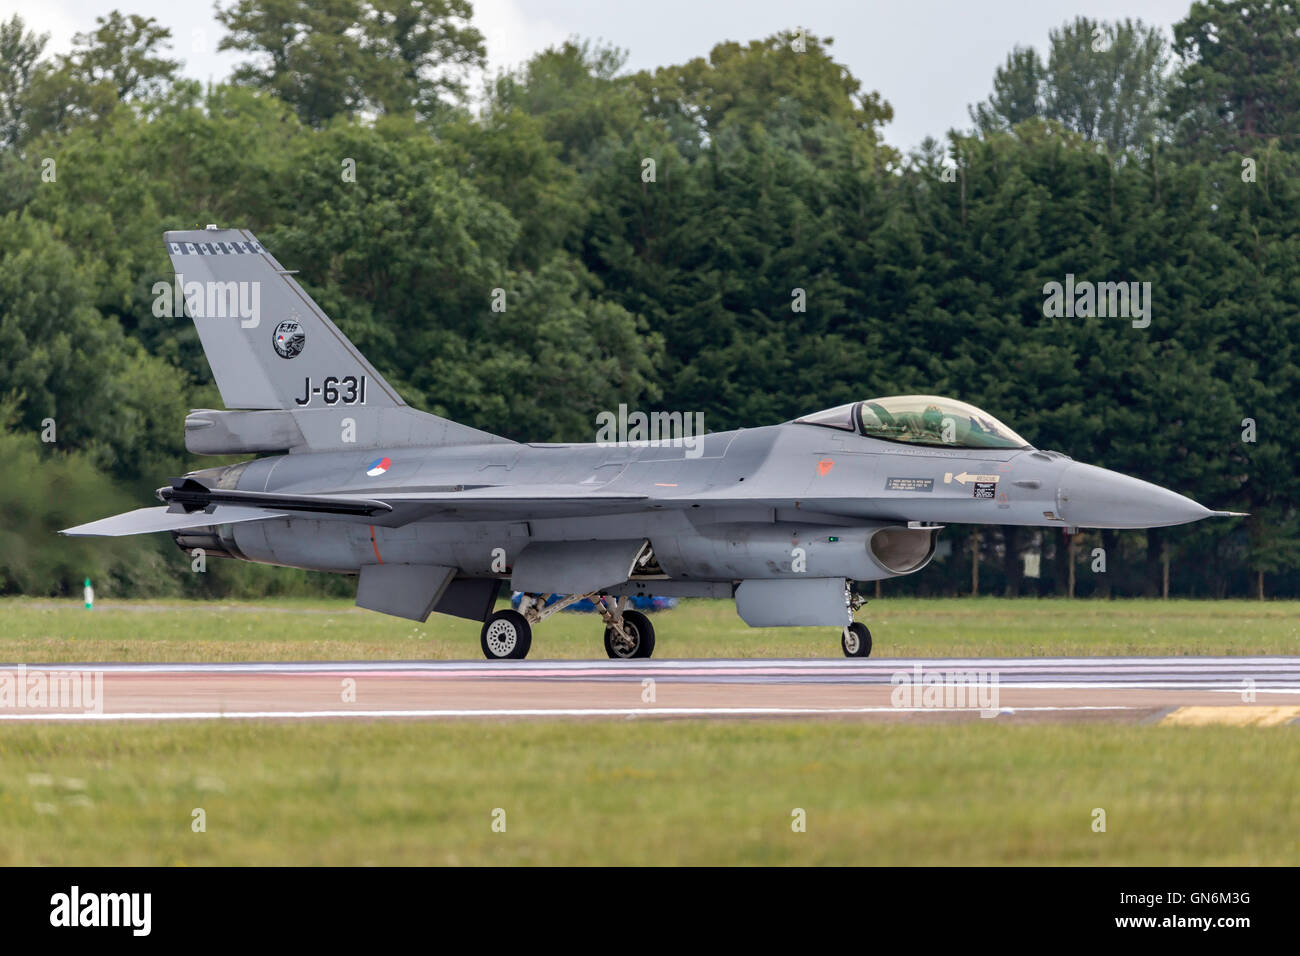 Royal Netherlands Air Force (Koninklijke Luchtmacht) General Dynamics F-16AM Fighter Aircraft. Stock Photo